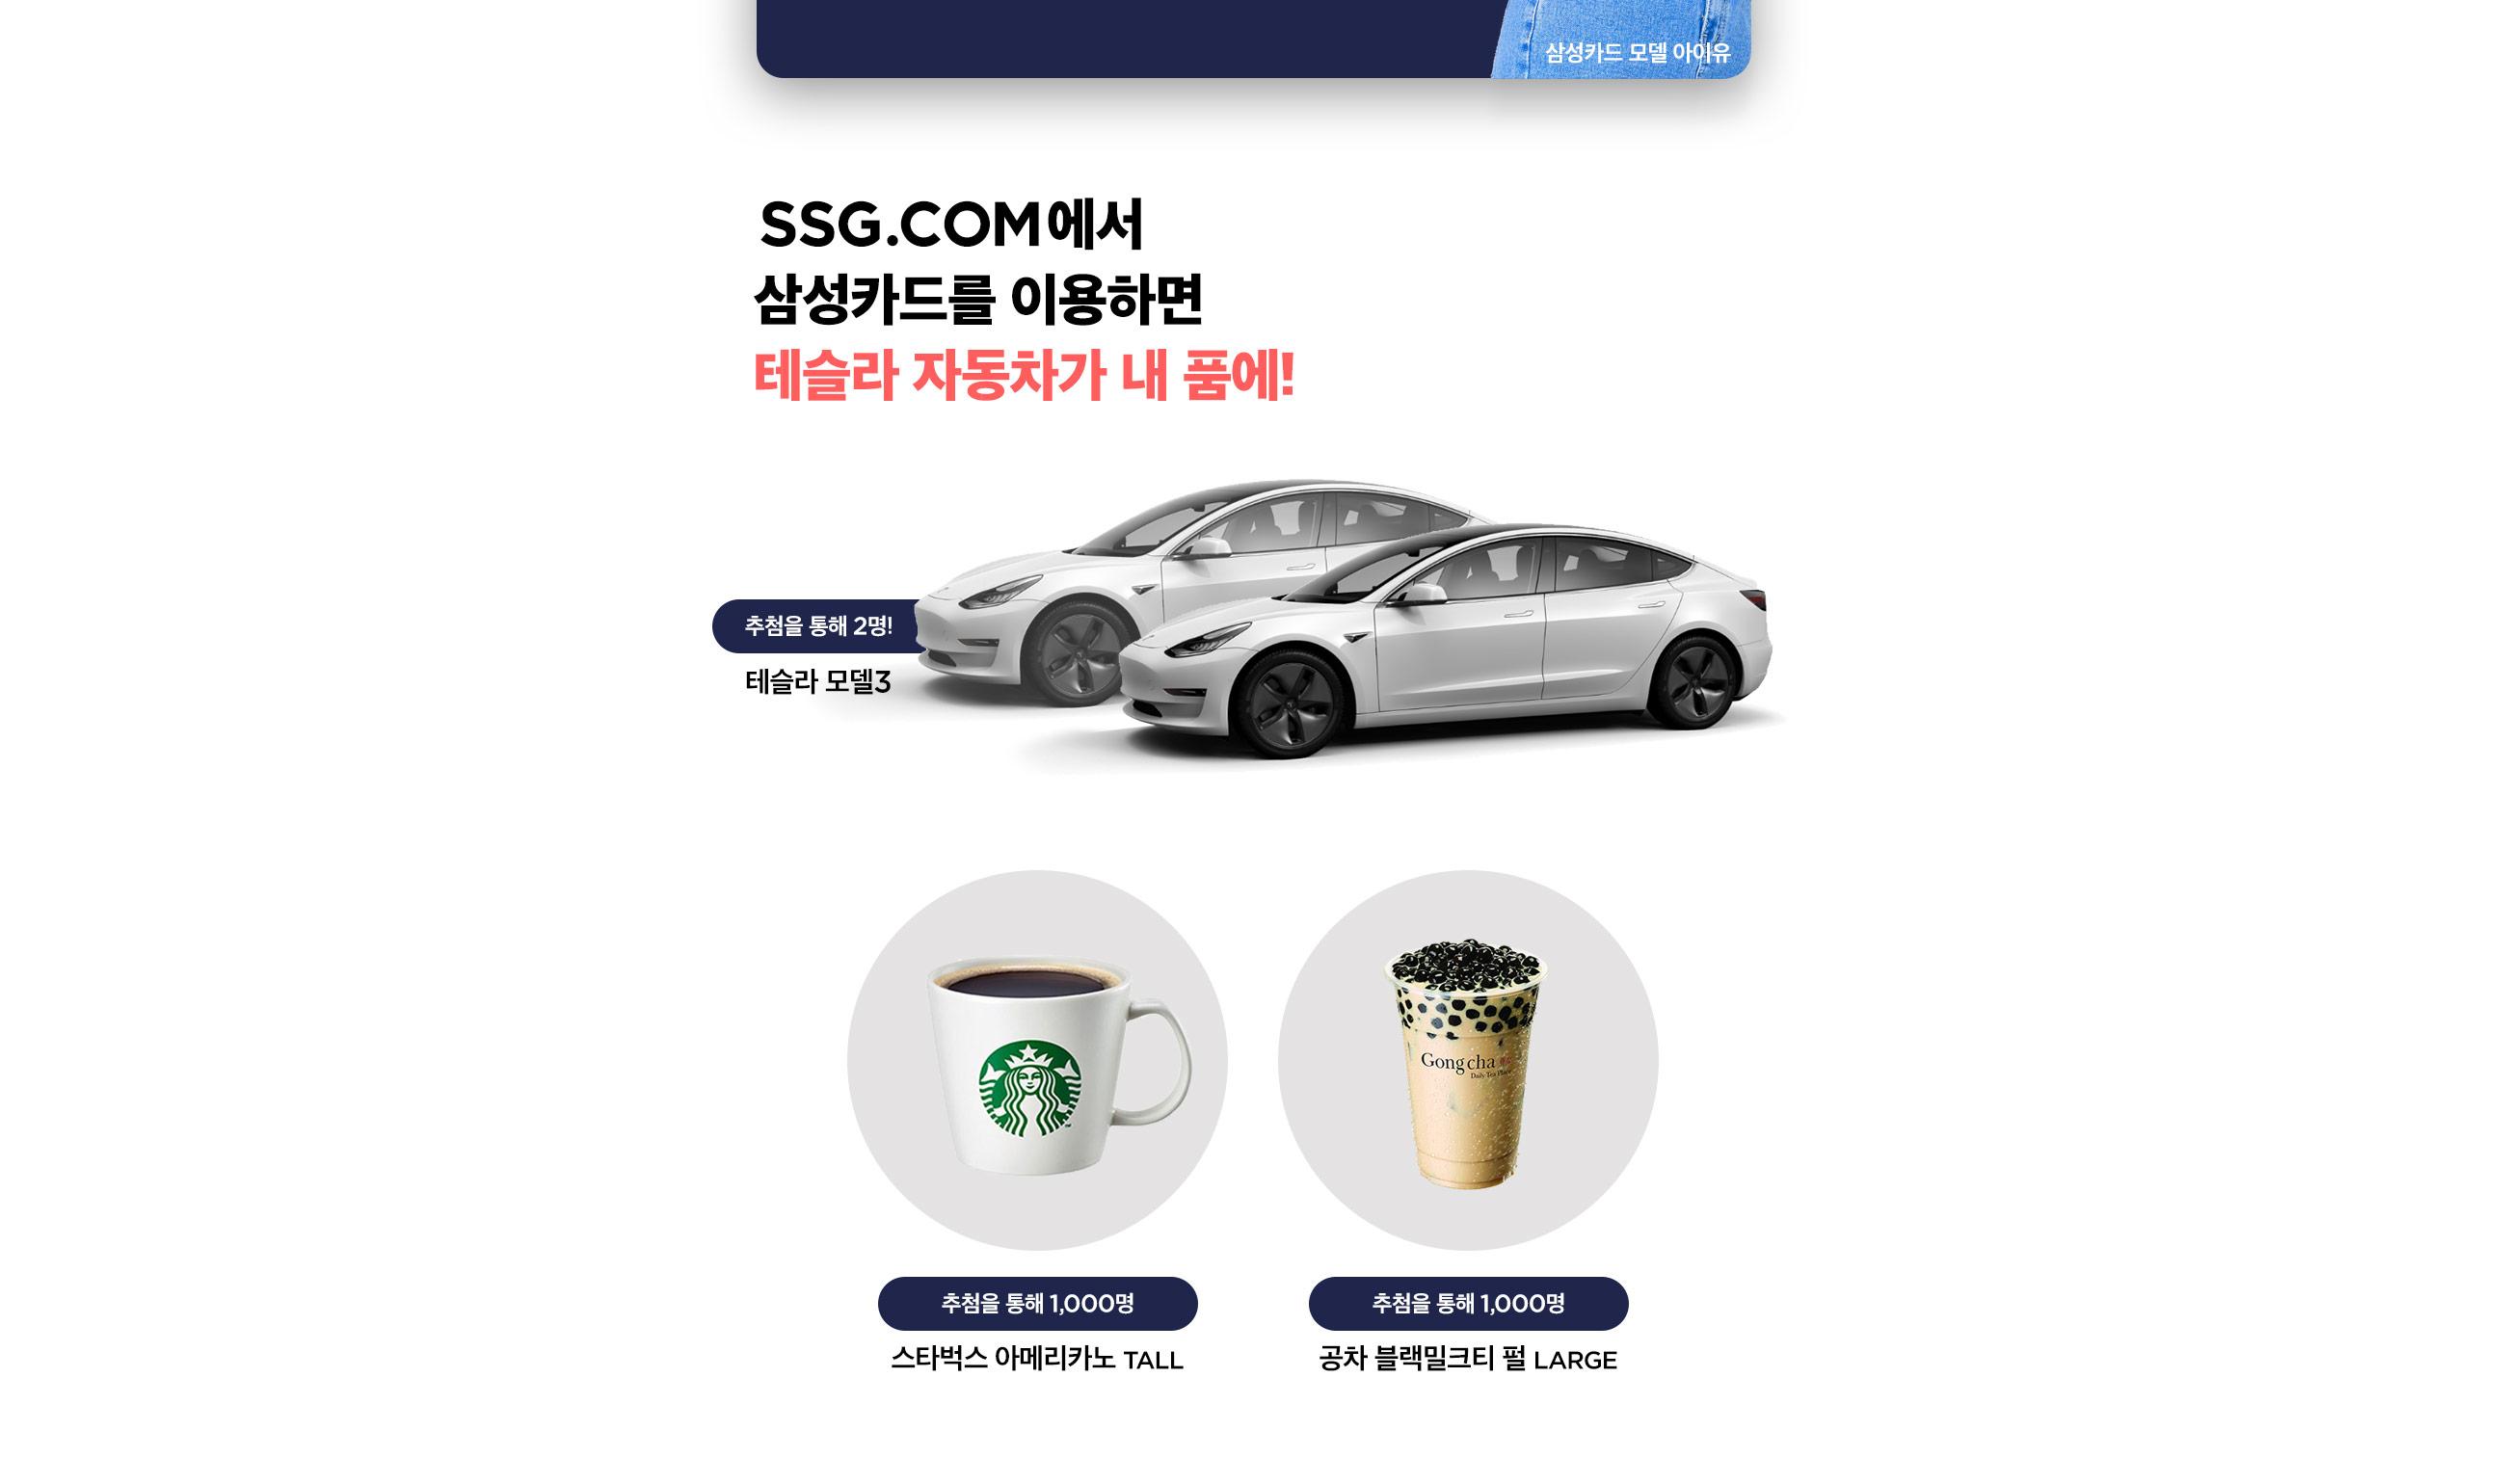 SSG.COM에서 삼성카드를 이용하면 테슬라 자동차가 내 품에!